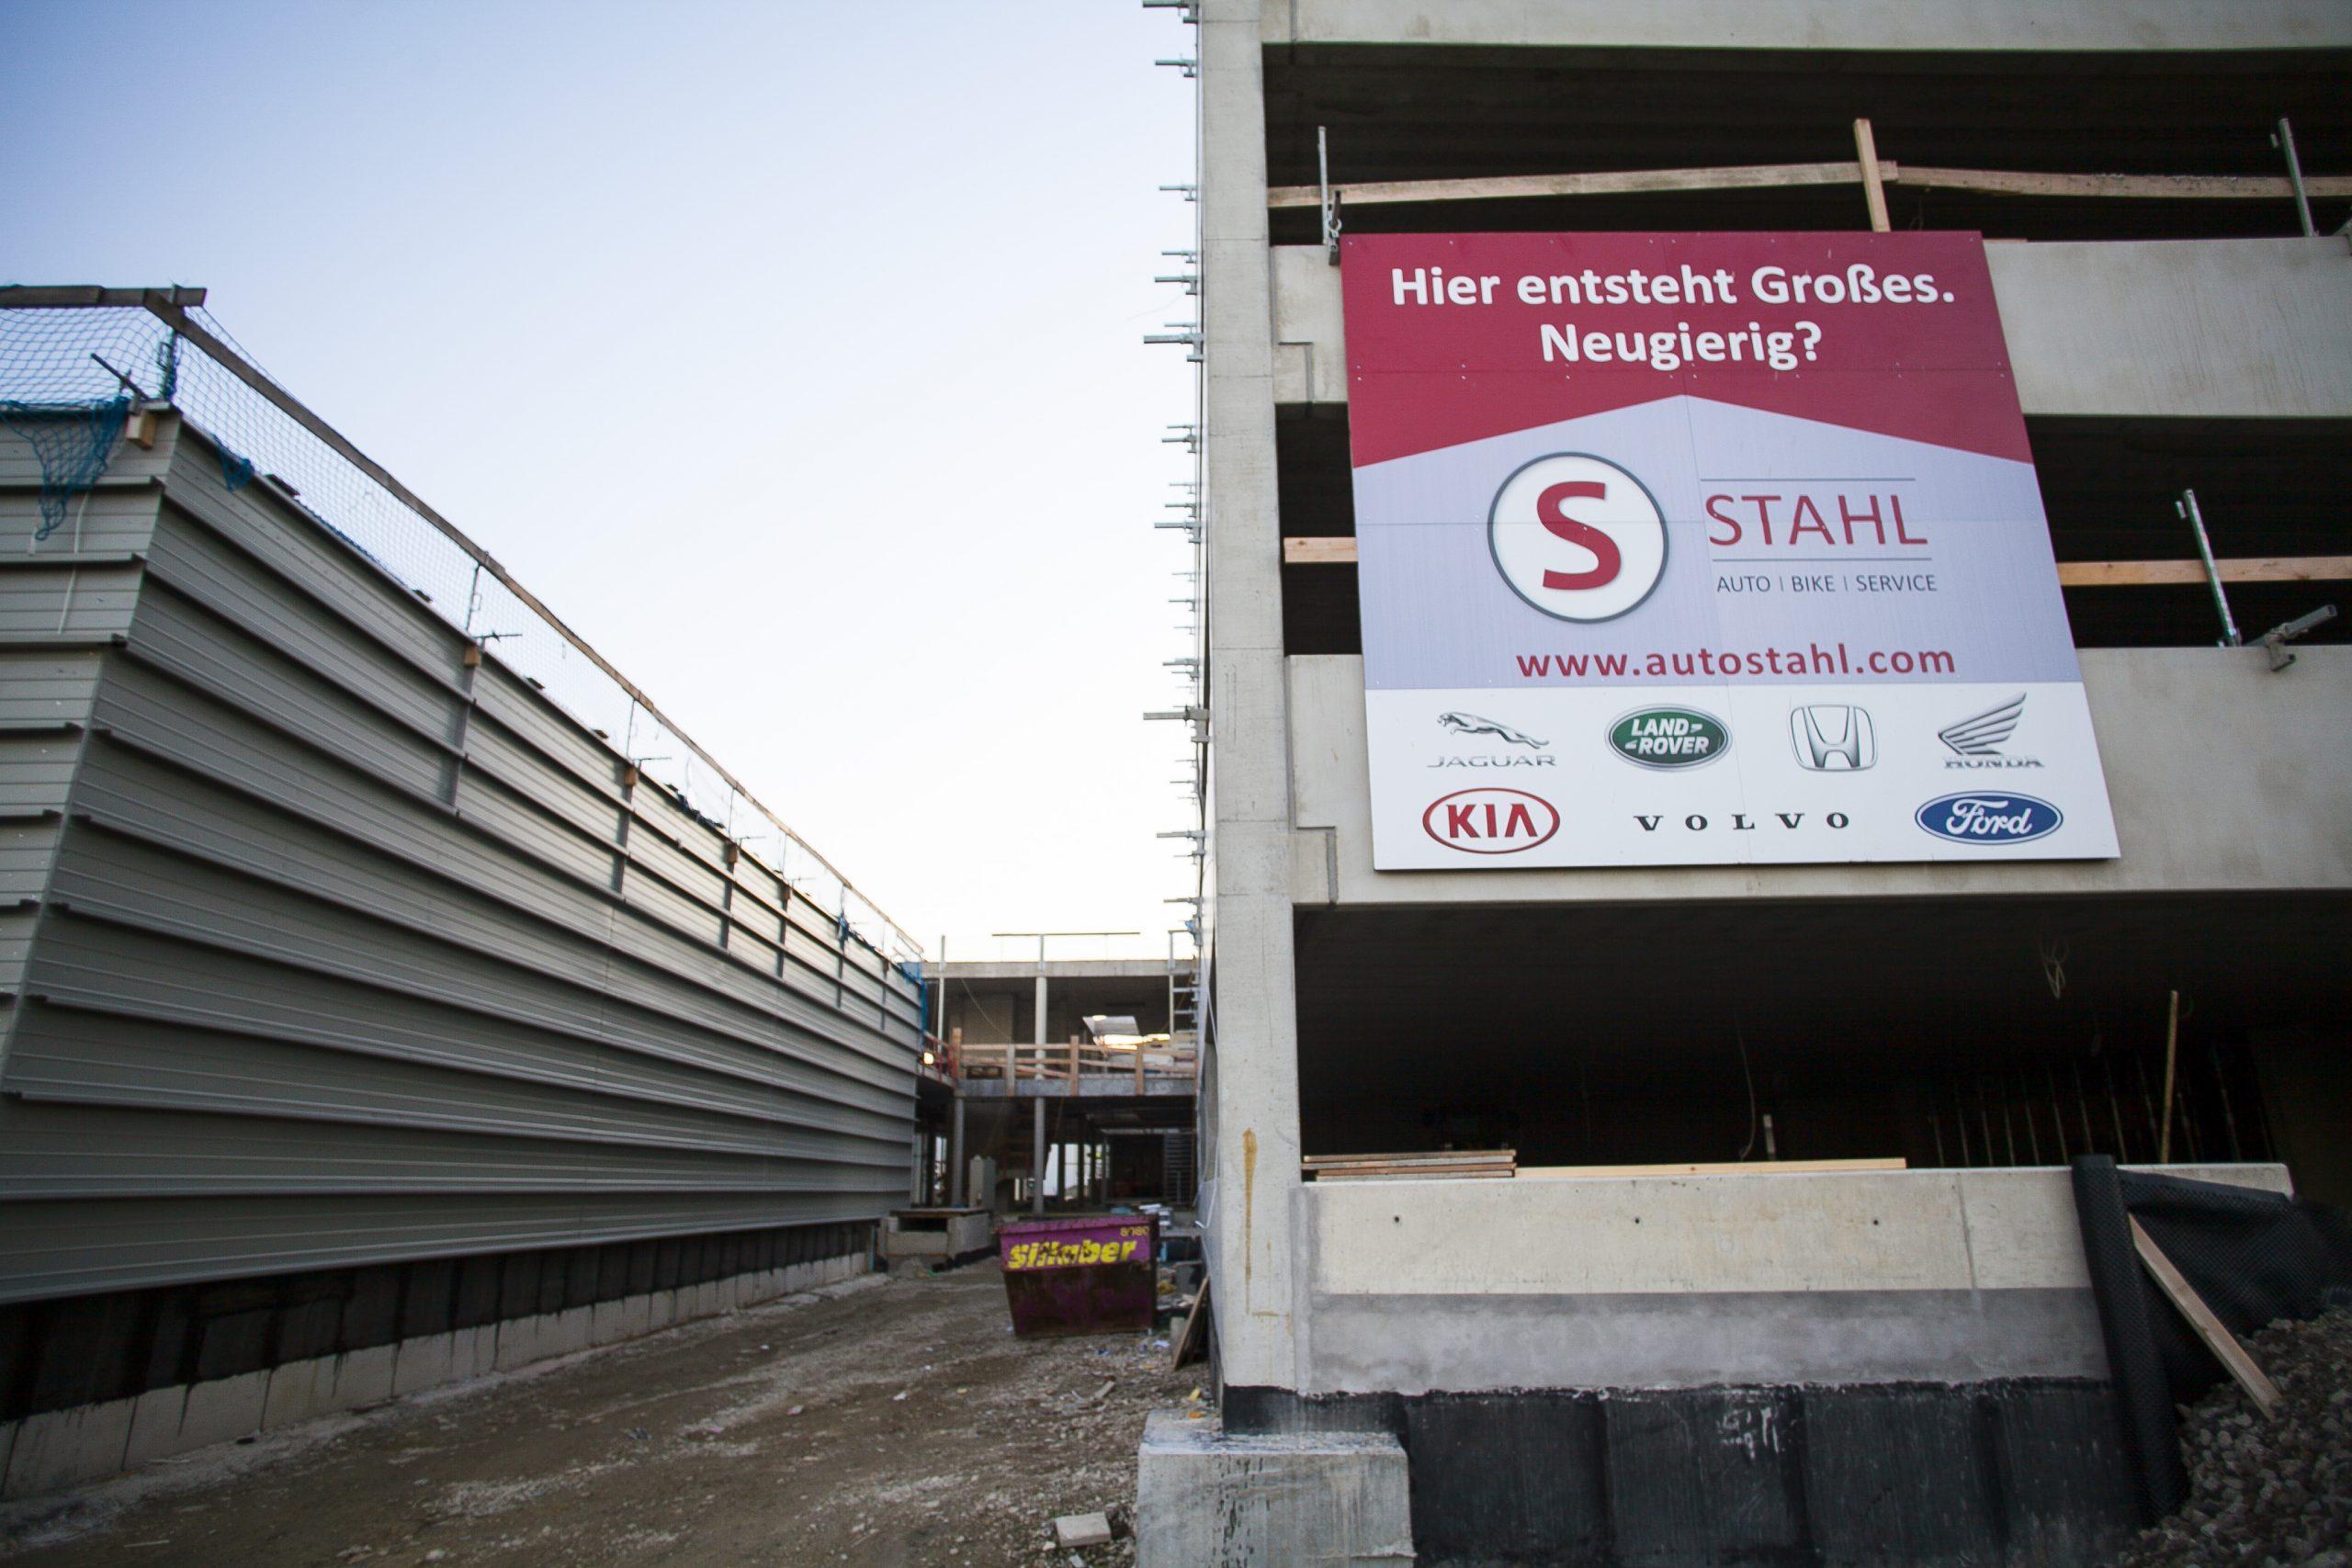 AUTO STAHL Wien 22 | Baustellentafel| Oktober 2020